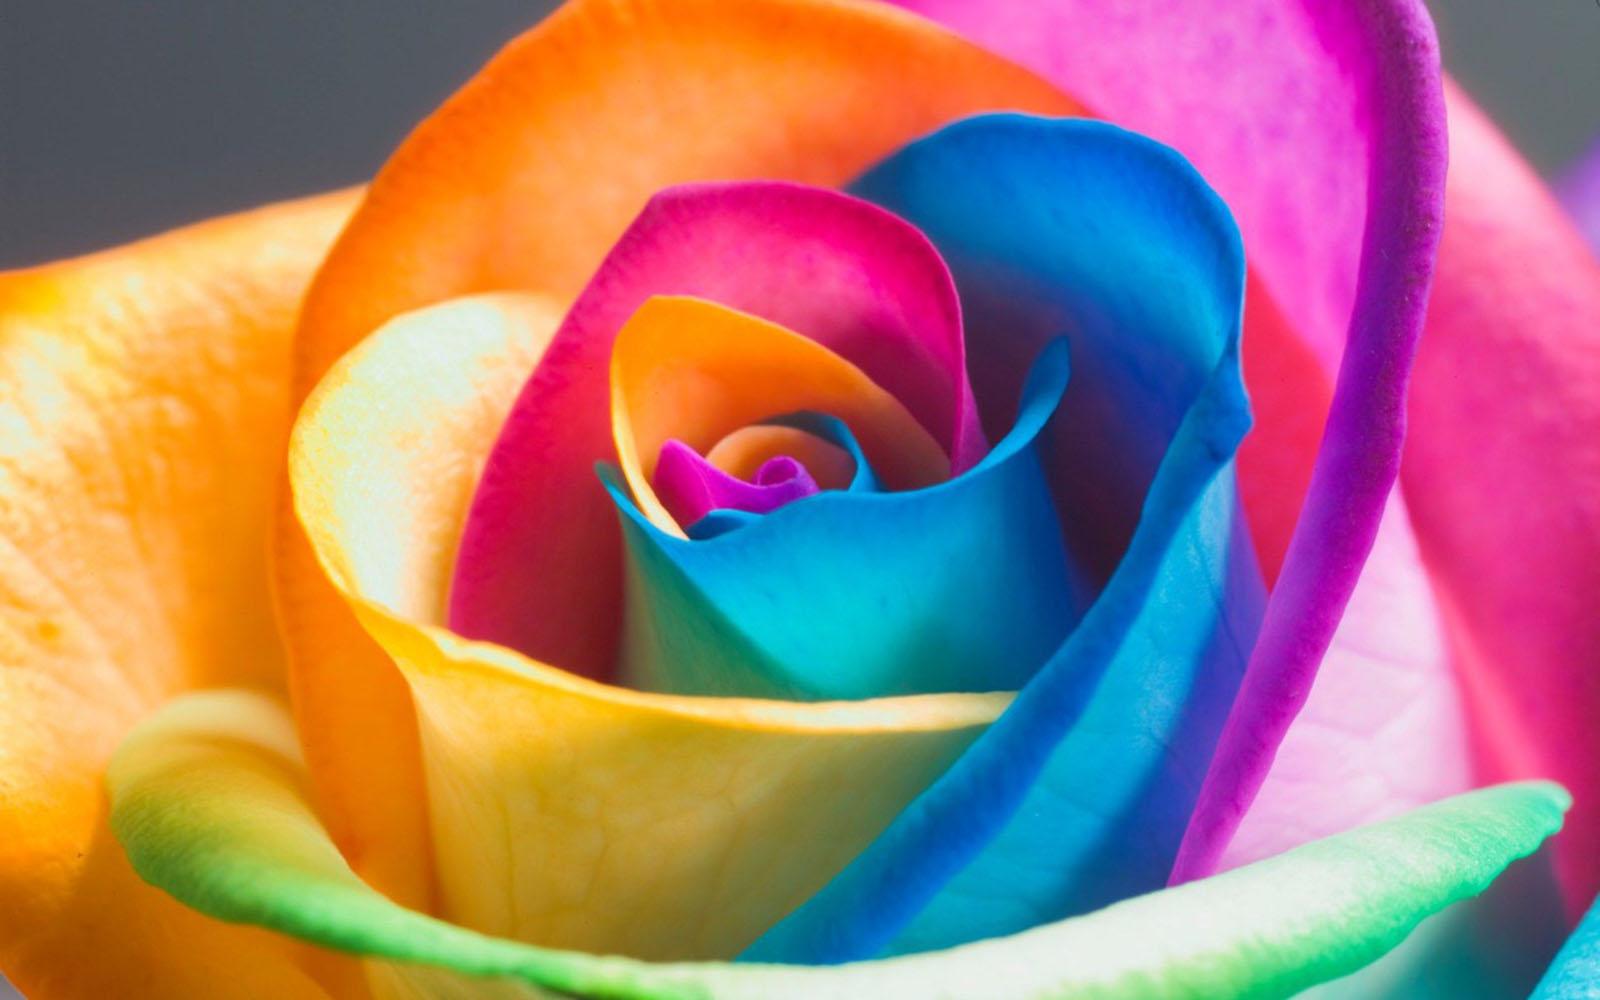 flower wallpaper colorful flower desktop wallpaper colorful flower 1600x1000